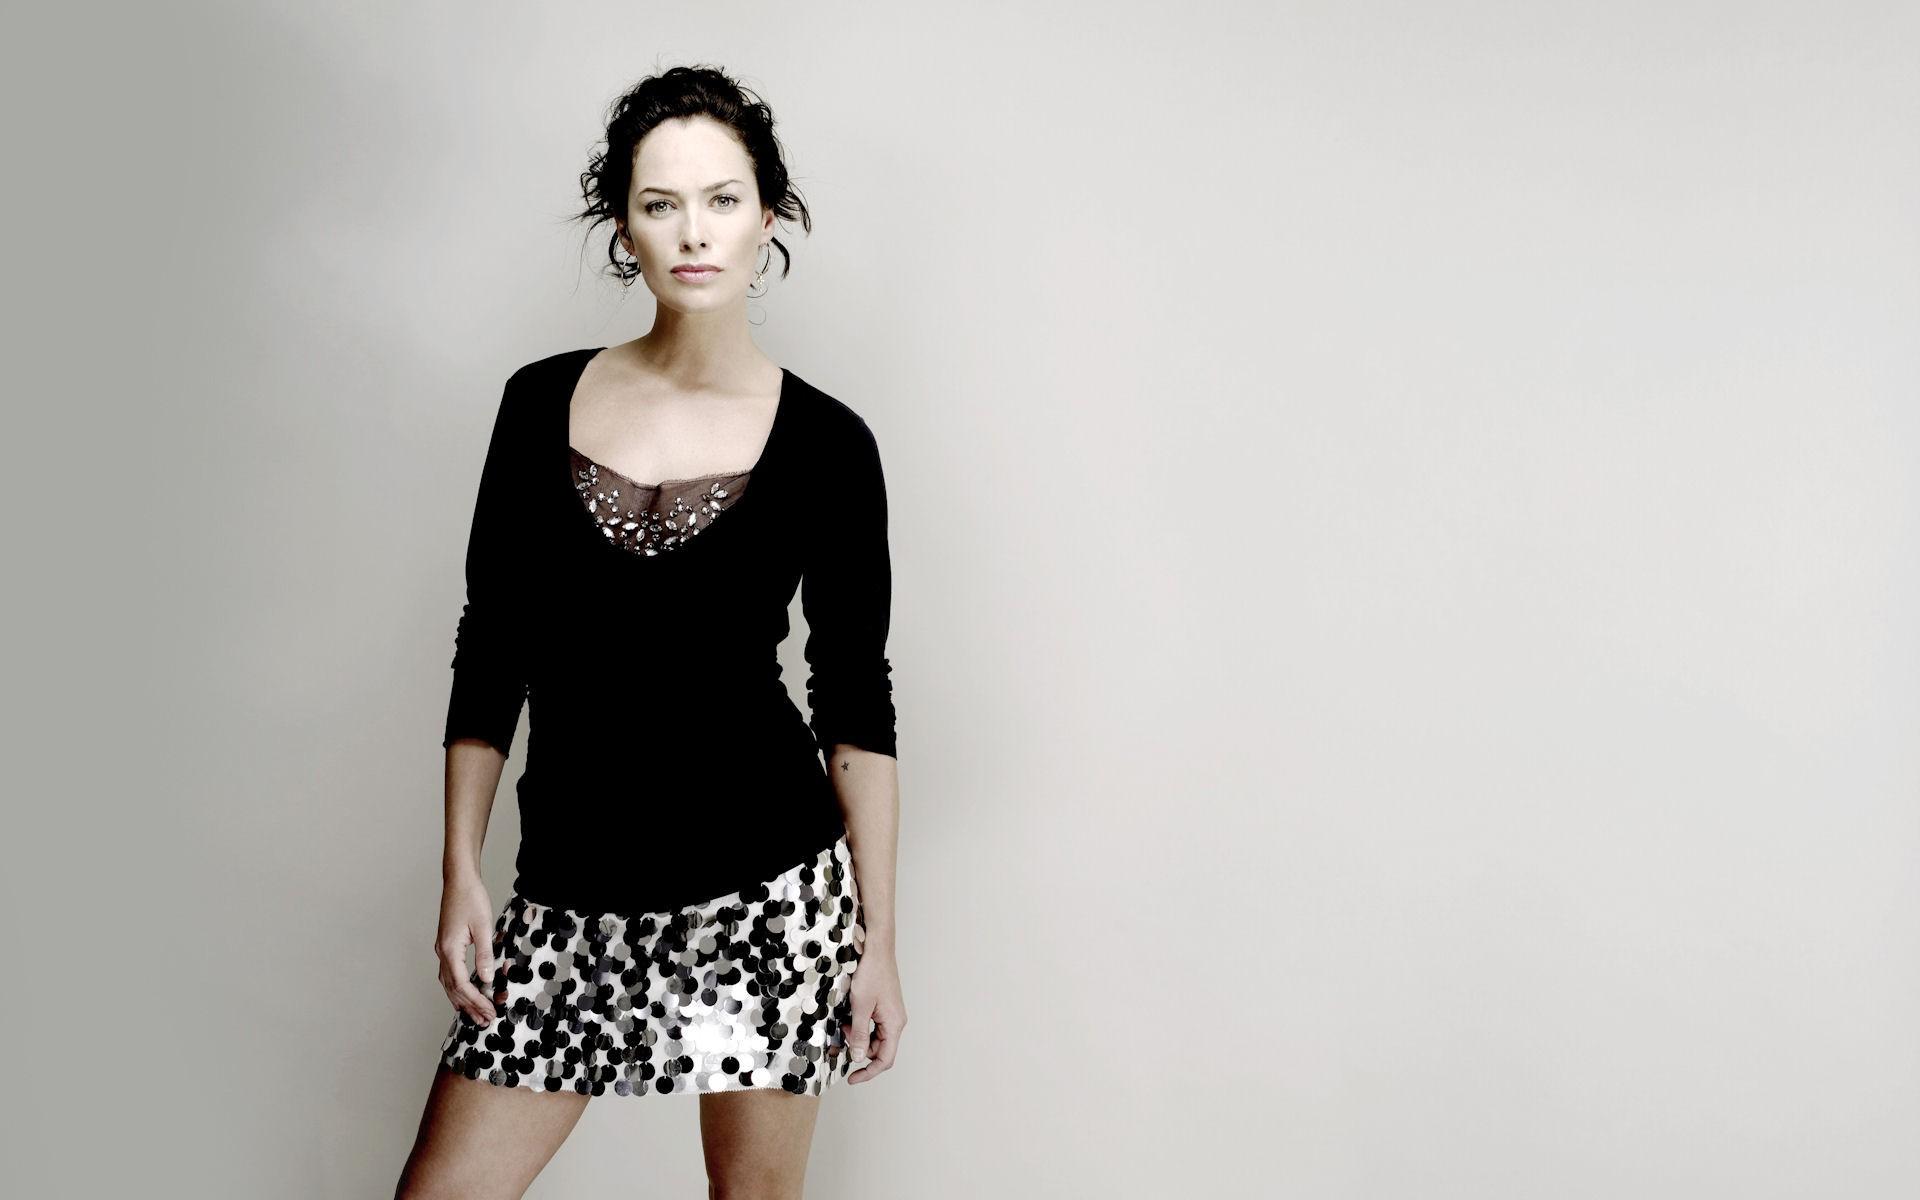 Beautiful Lena Headey